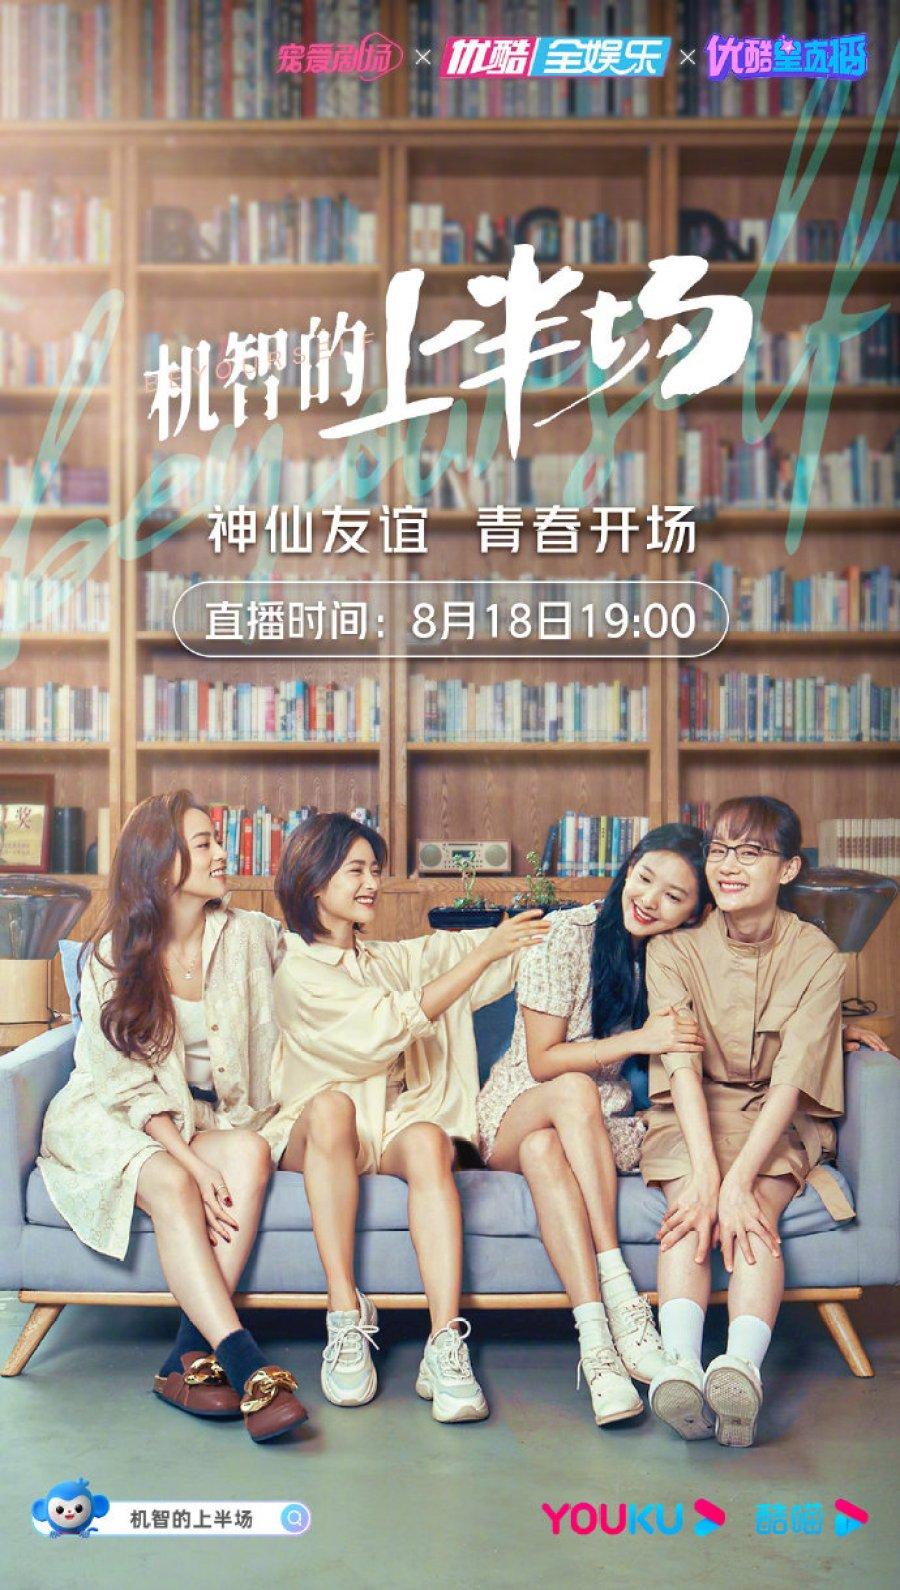 RLYyP 4f - Будь собой ✸ 2021 ✸ Китай